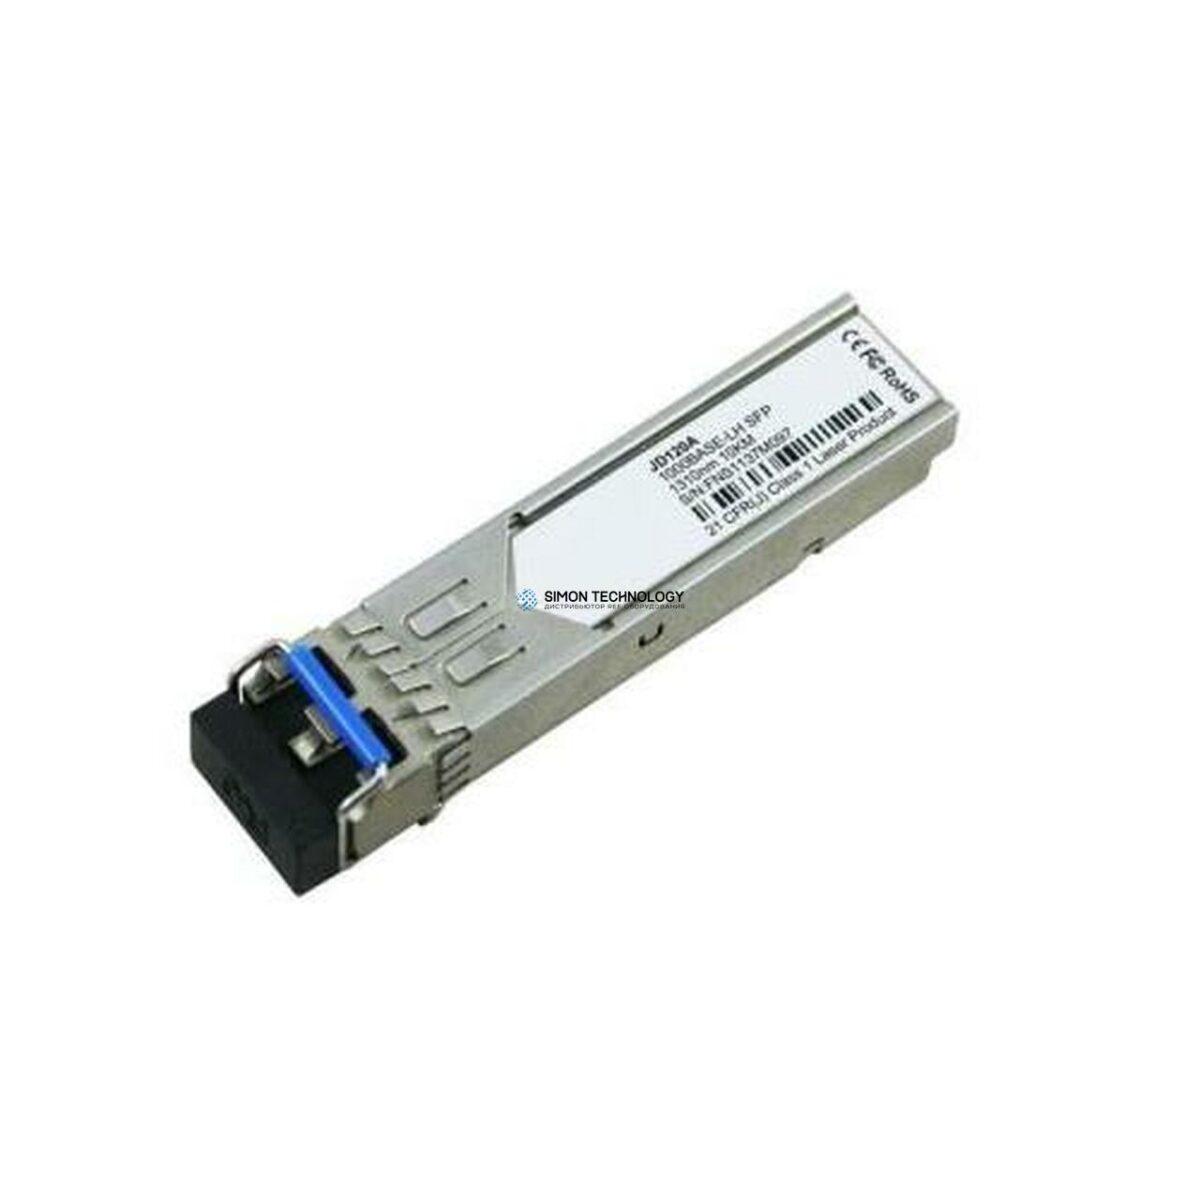 Трансивер SFP HP HPE X110 100M SFP LC LX Transceiver (JD120-61201)